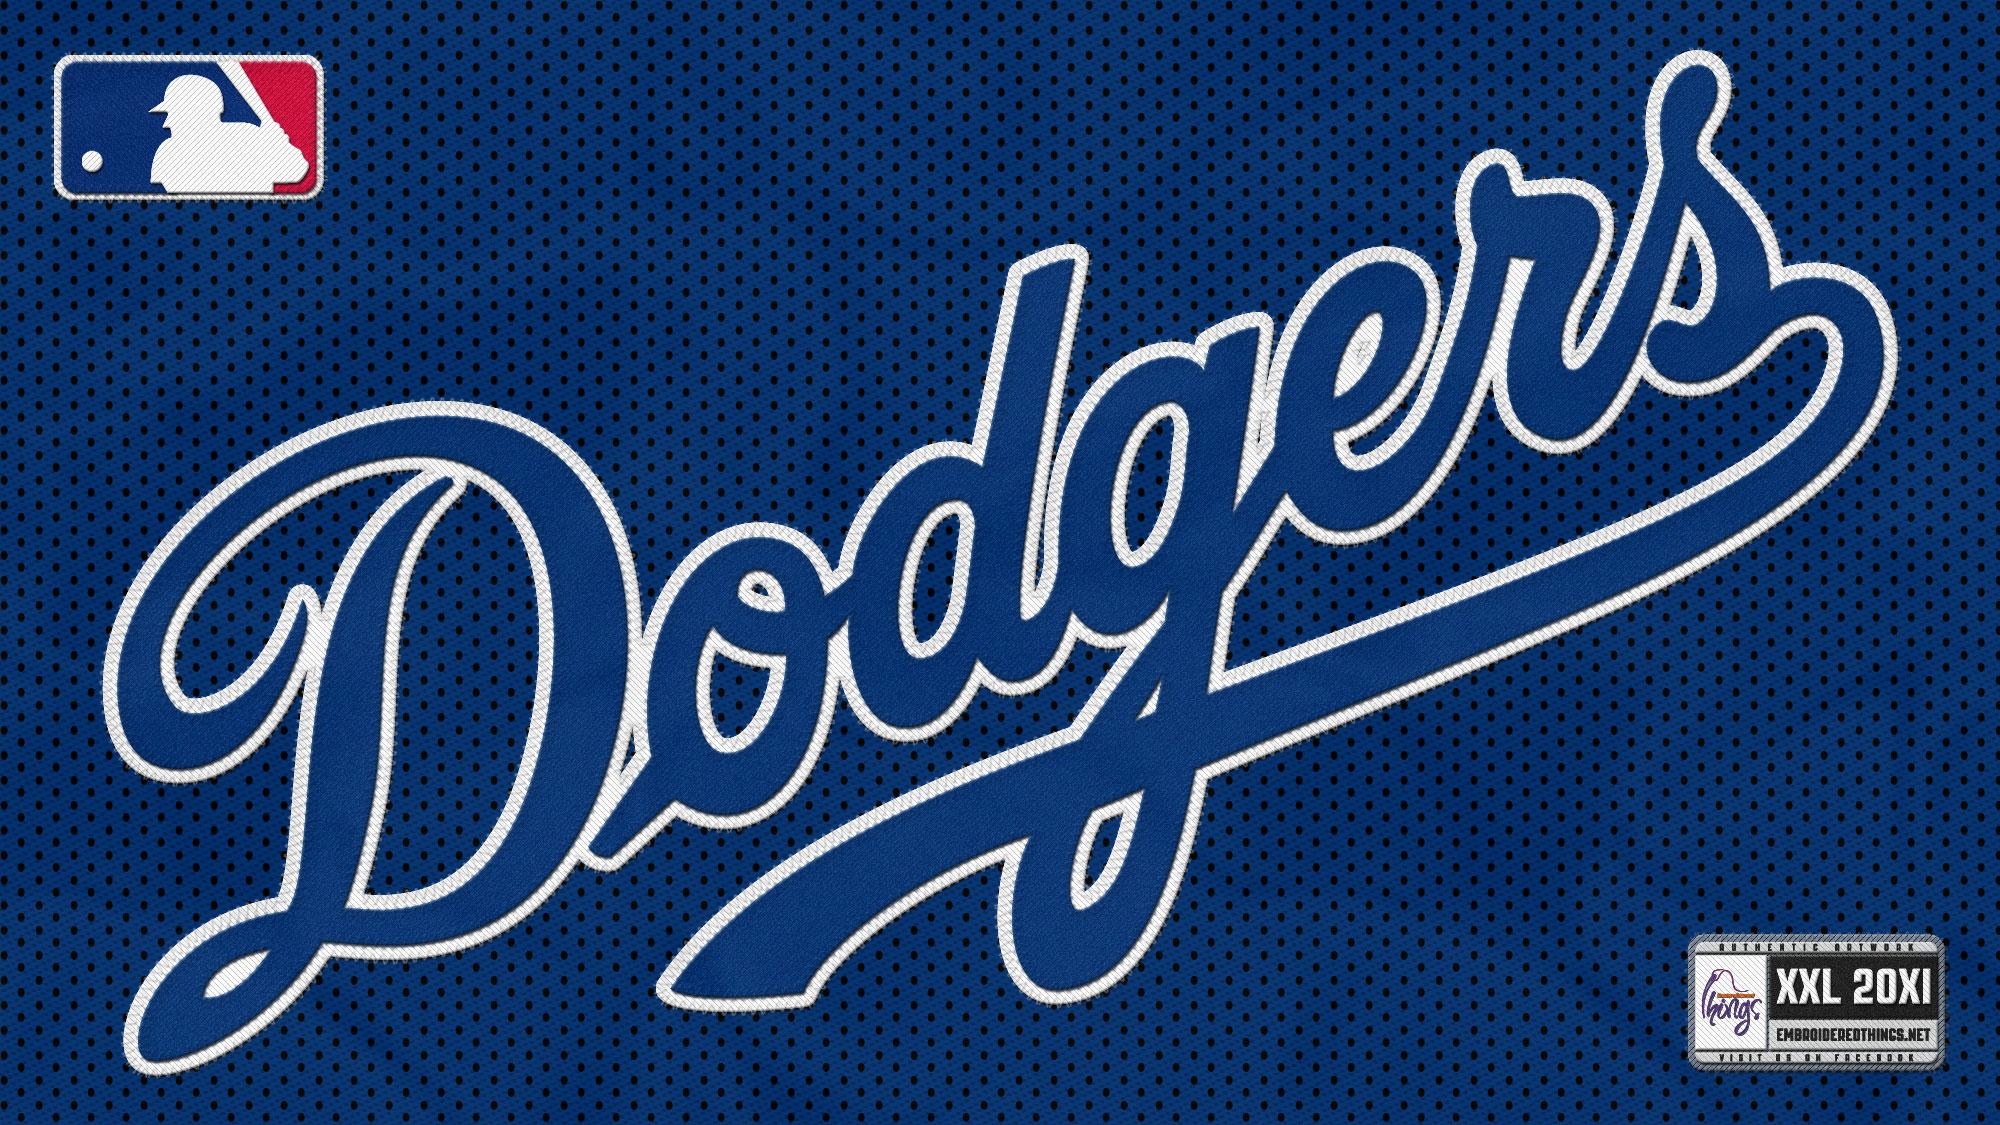 baseballbaseball wallpapers los angeles dodgers logo wallpaperhtml 2000x1125